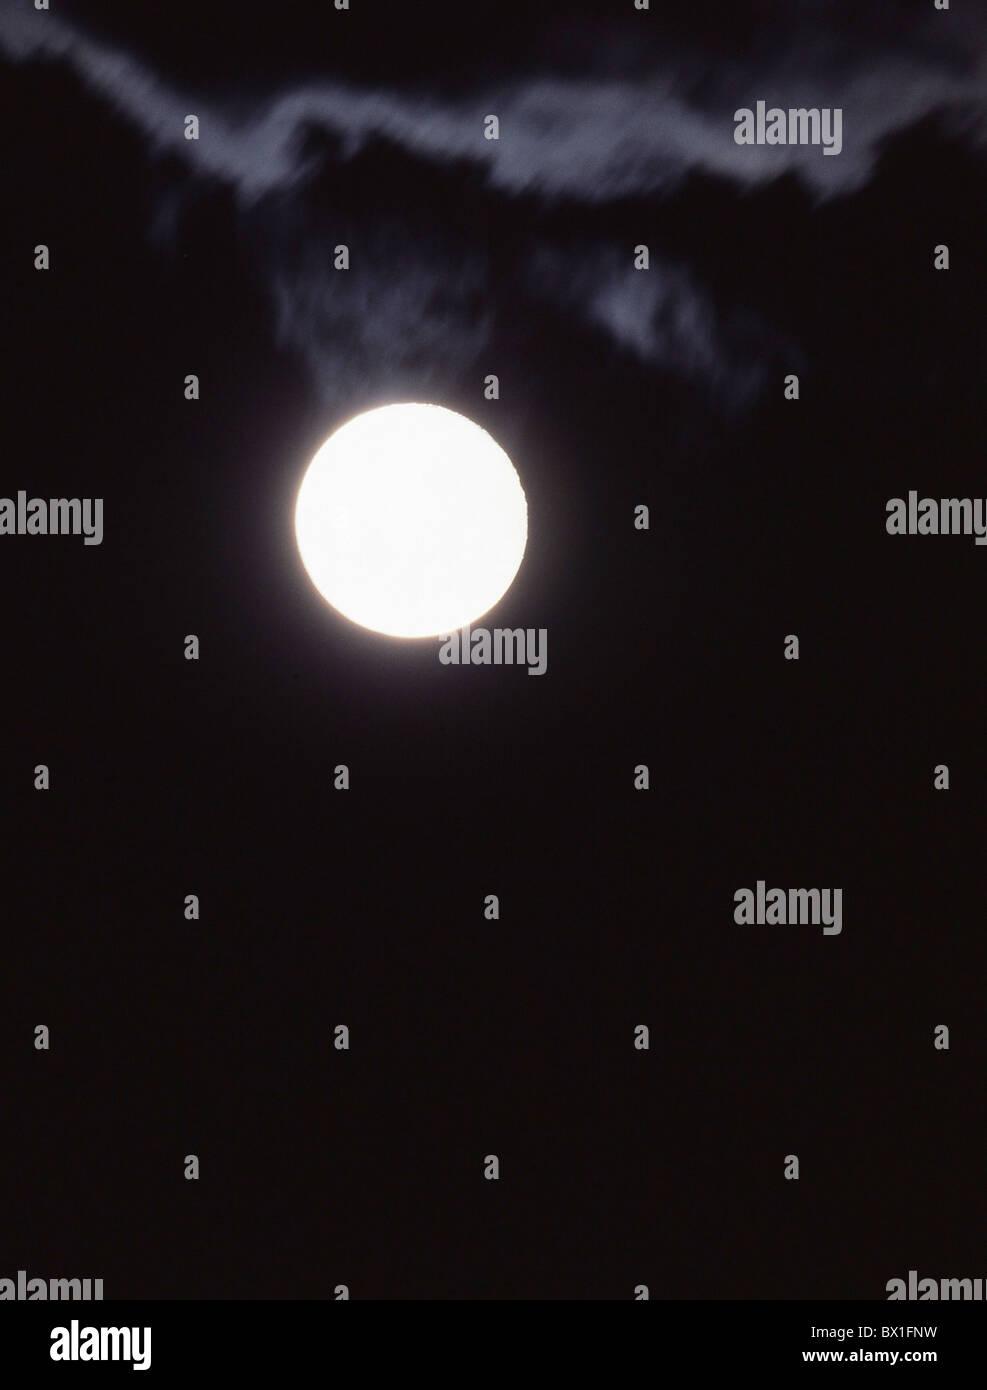 Moon full moon night black sky round - Stock Image